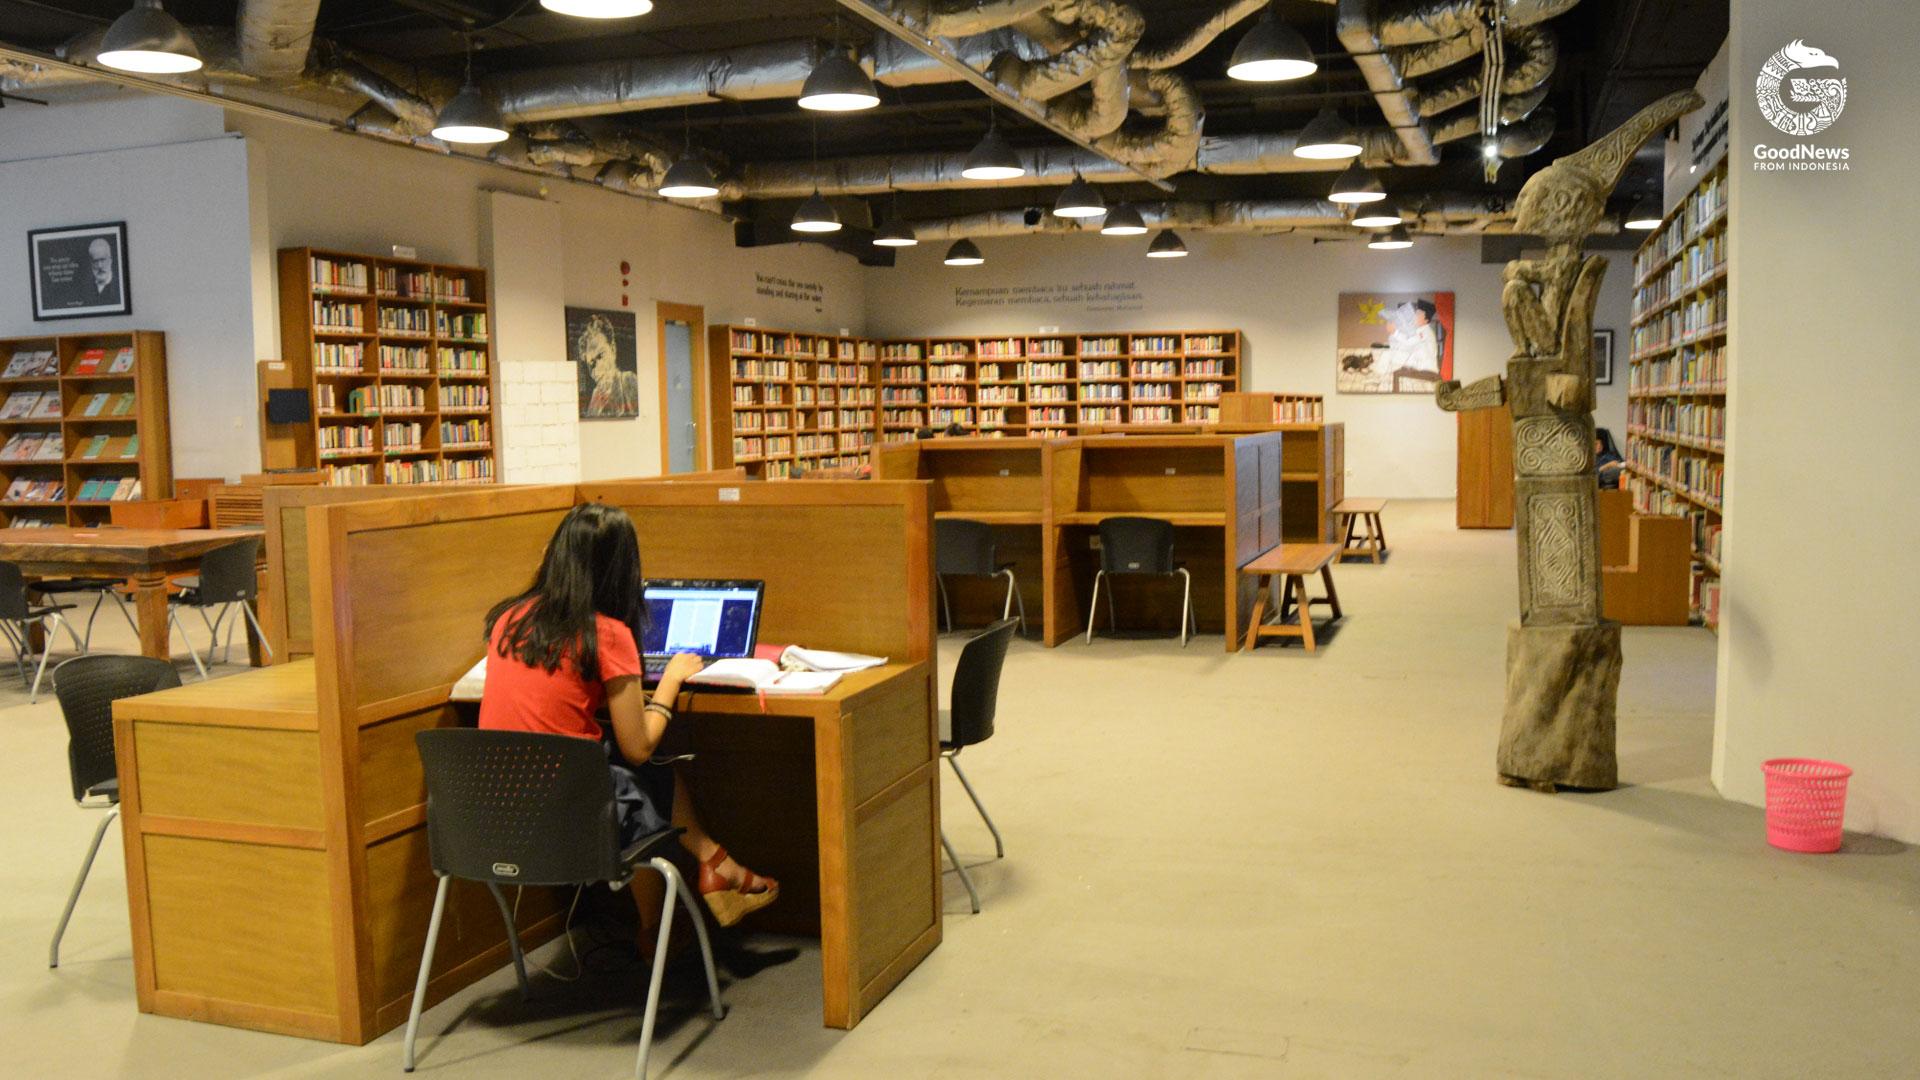 Meja berbilik di Perpustakaan Freedom | Foto: Novita Caesaria/GNFI